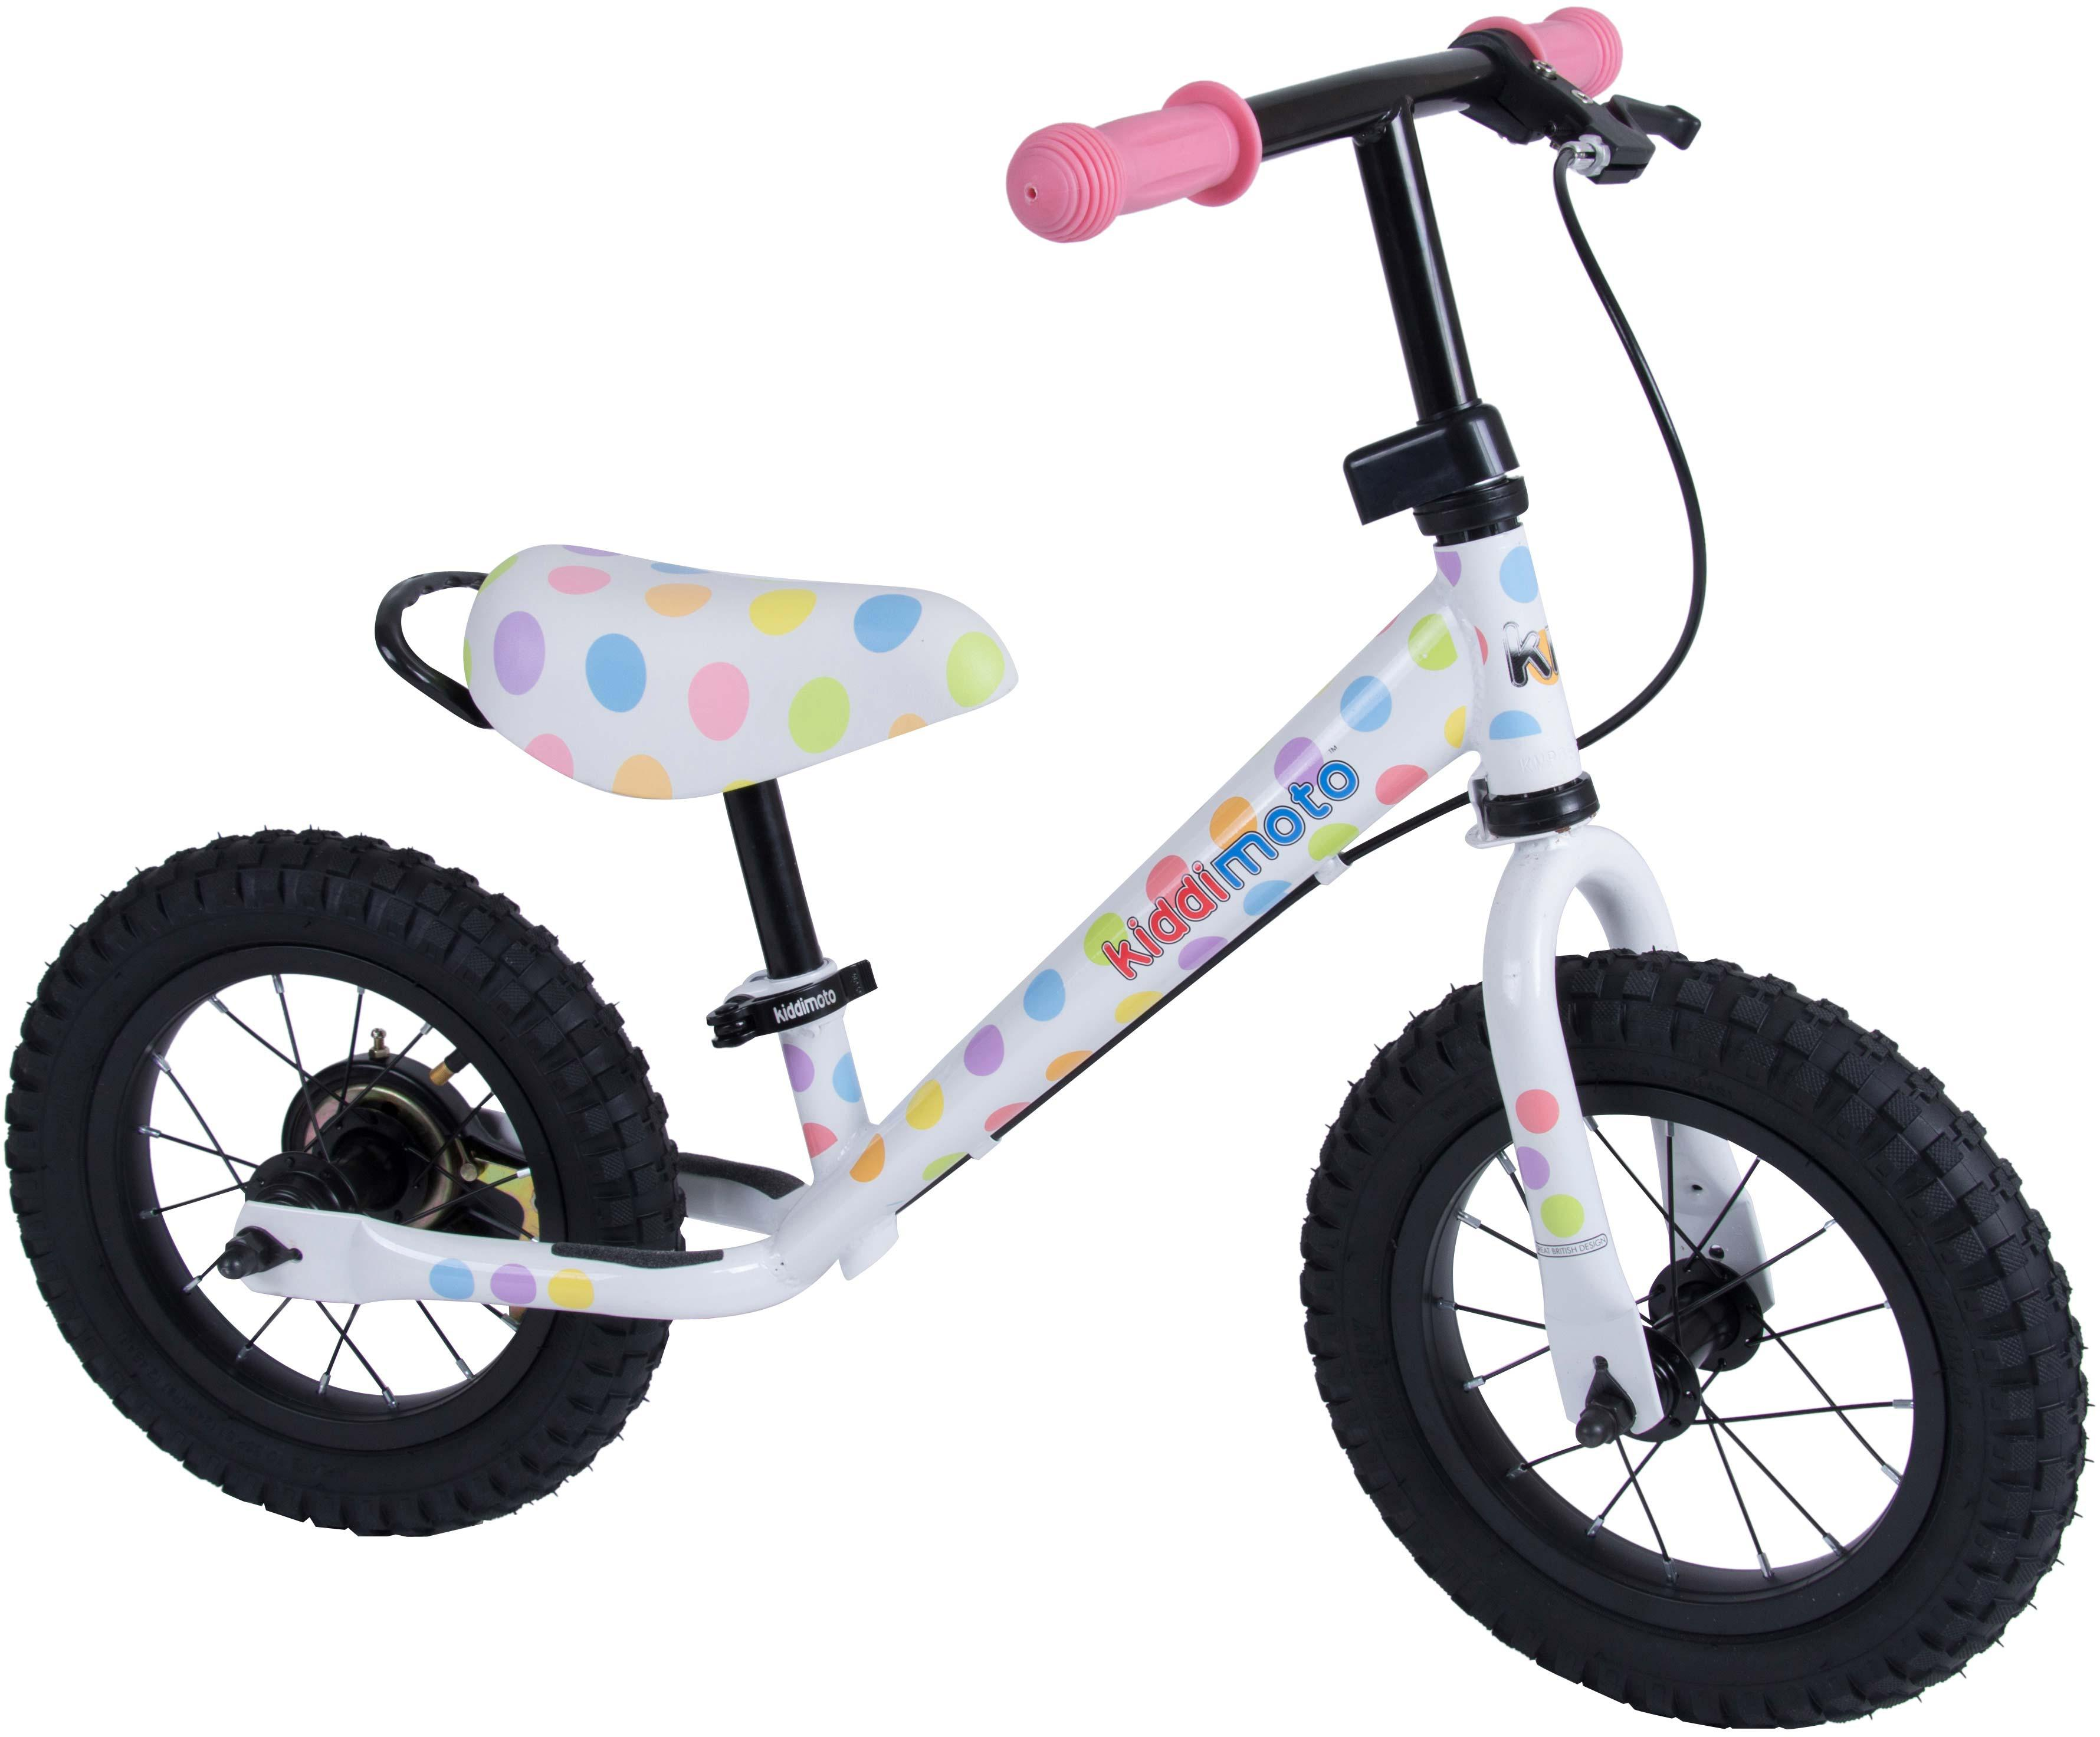 Kiddimoto Super Junior Max Pastel Dotty Balance Bike - 12 inch Wheel